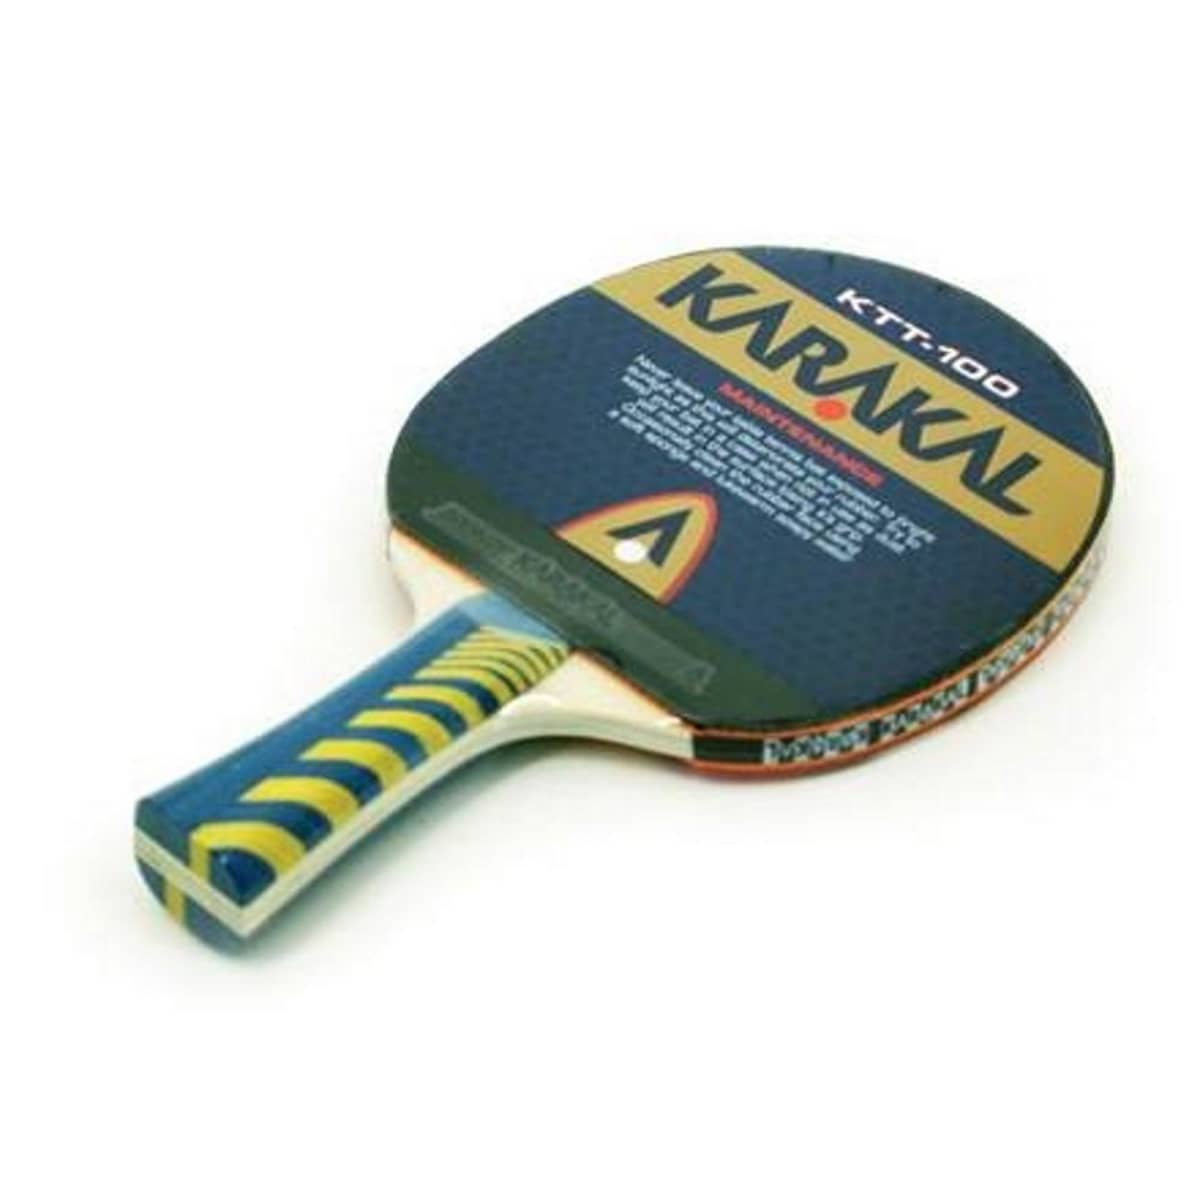 9c4a26c7402 Karakal KTT 100 Table Tennis Bat